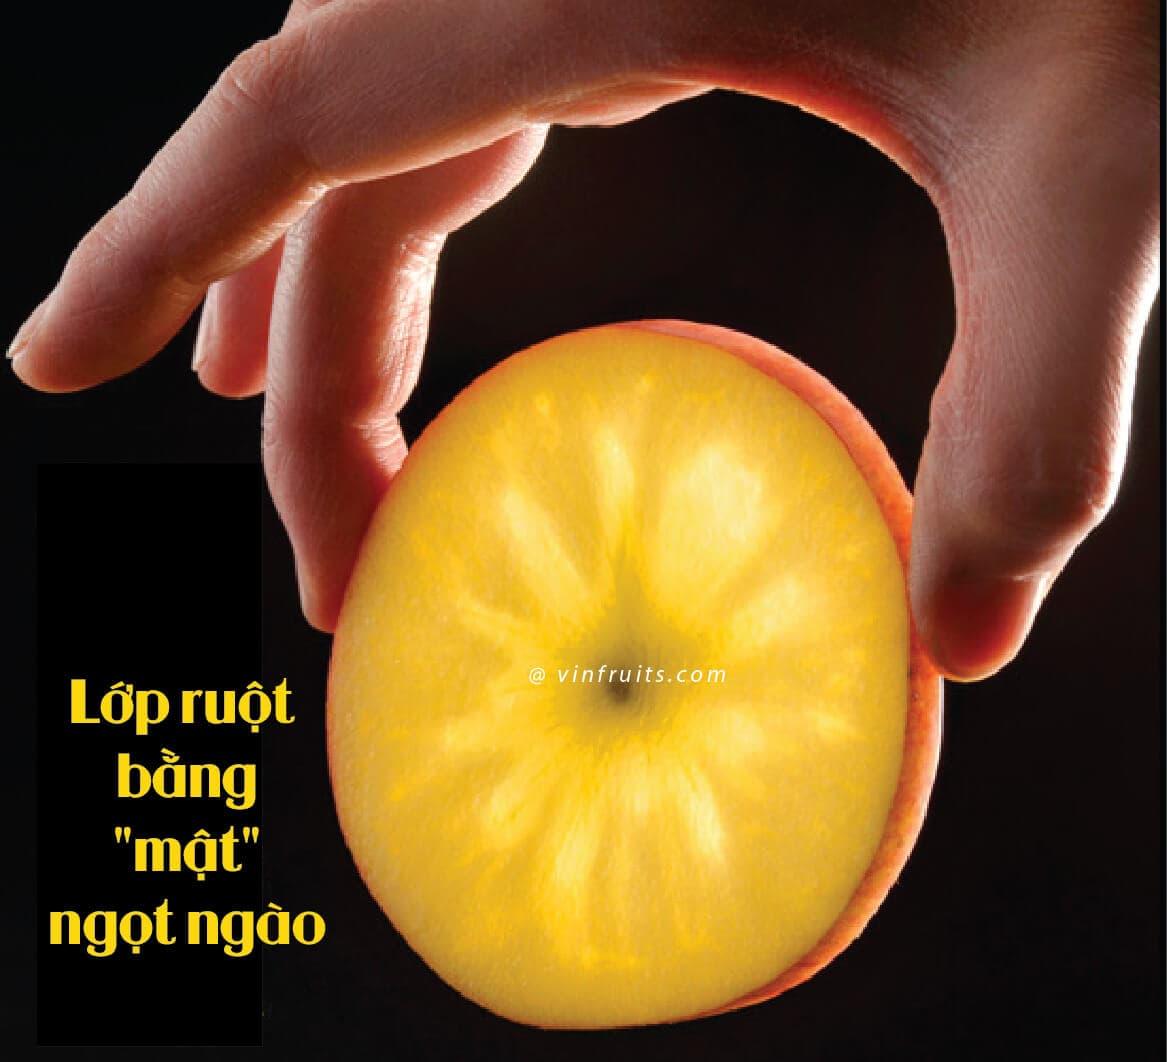 Tao mat Nhat Ban - vinfruits 3